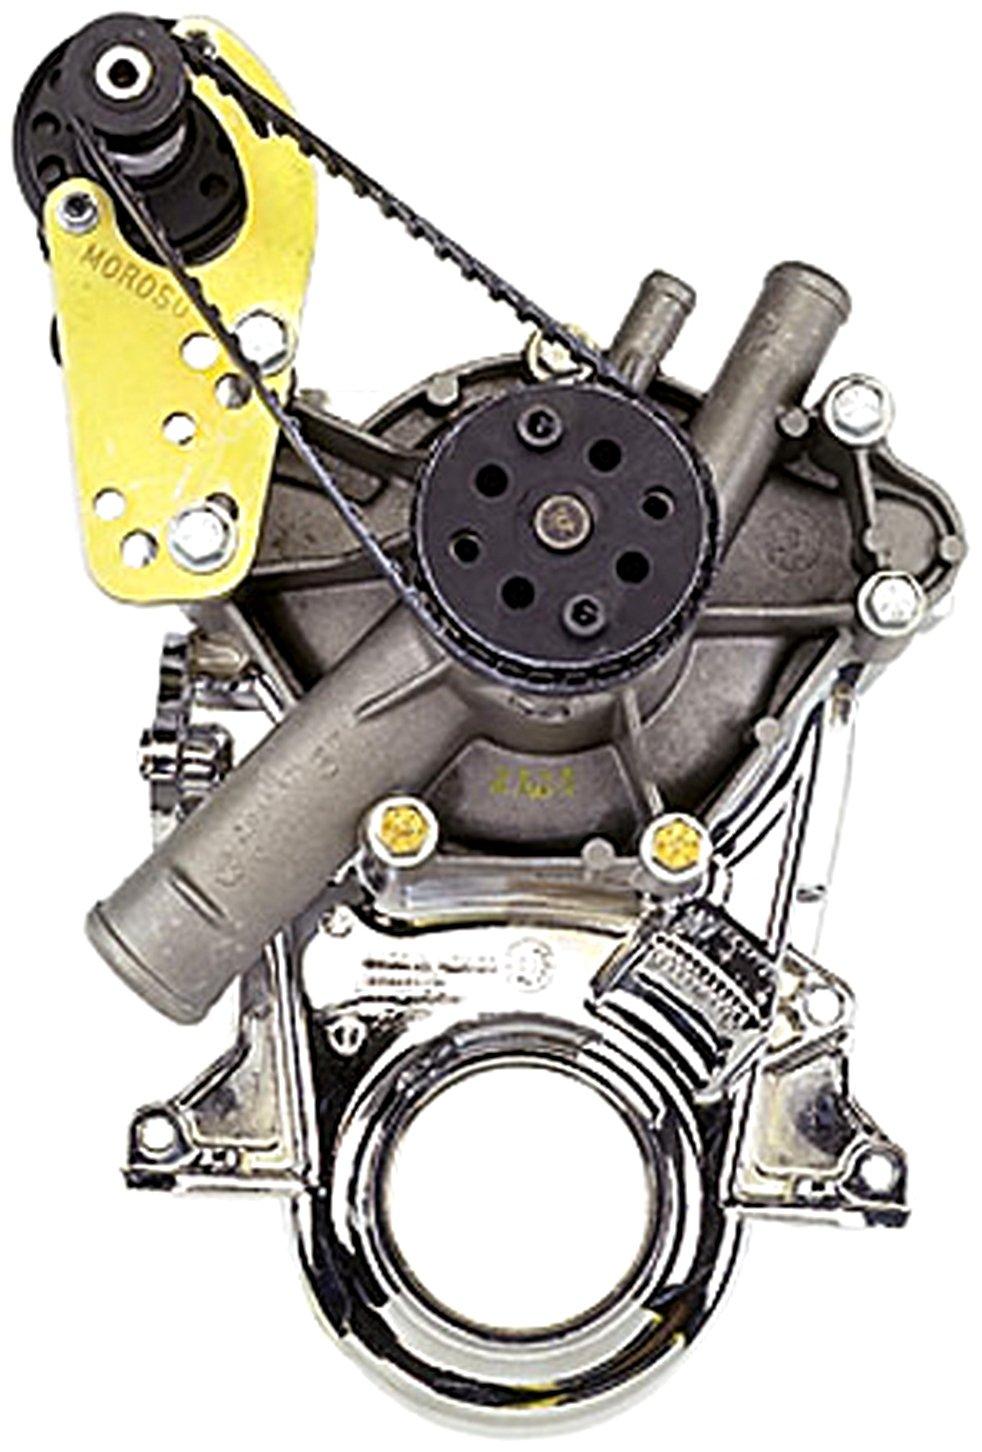 Moroso 63750 Electric Water Pump Drive Kit by Moroso (Image #3)